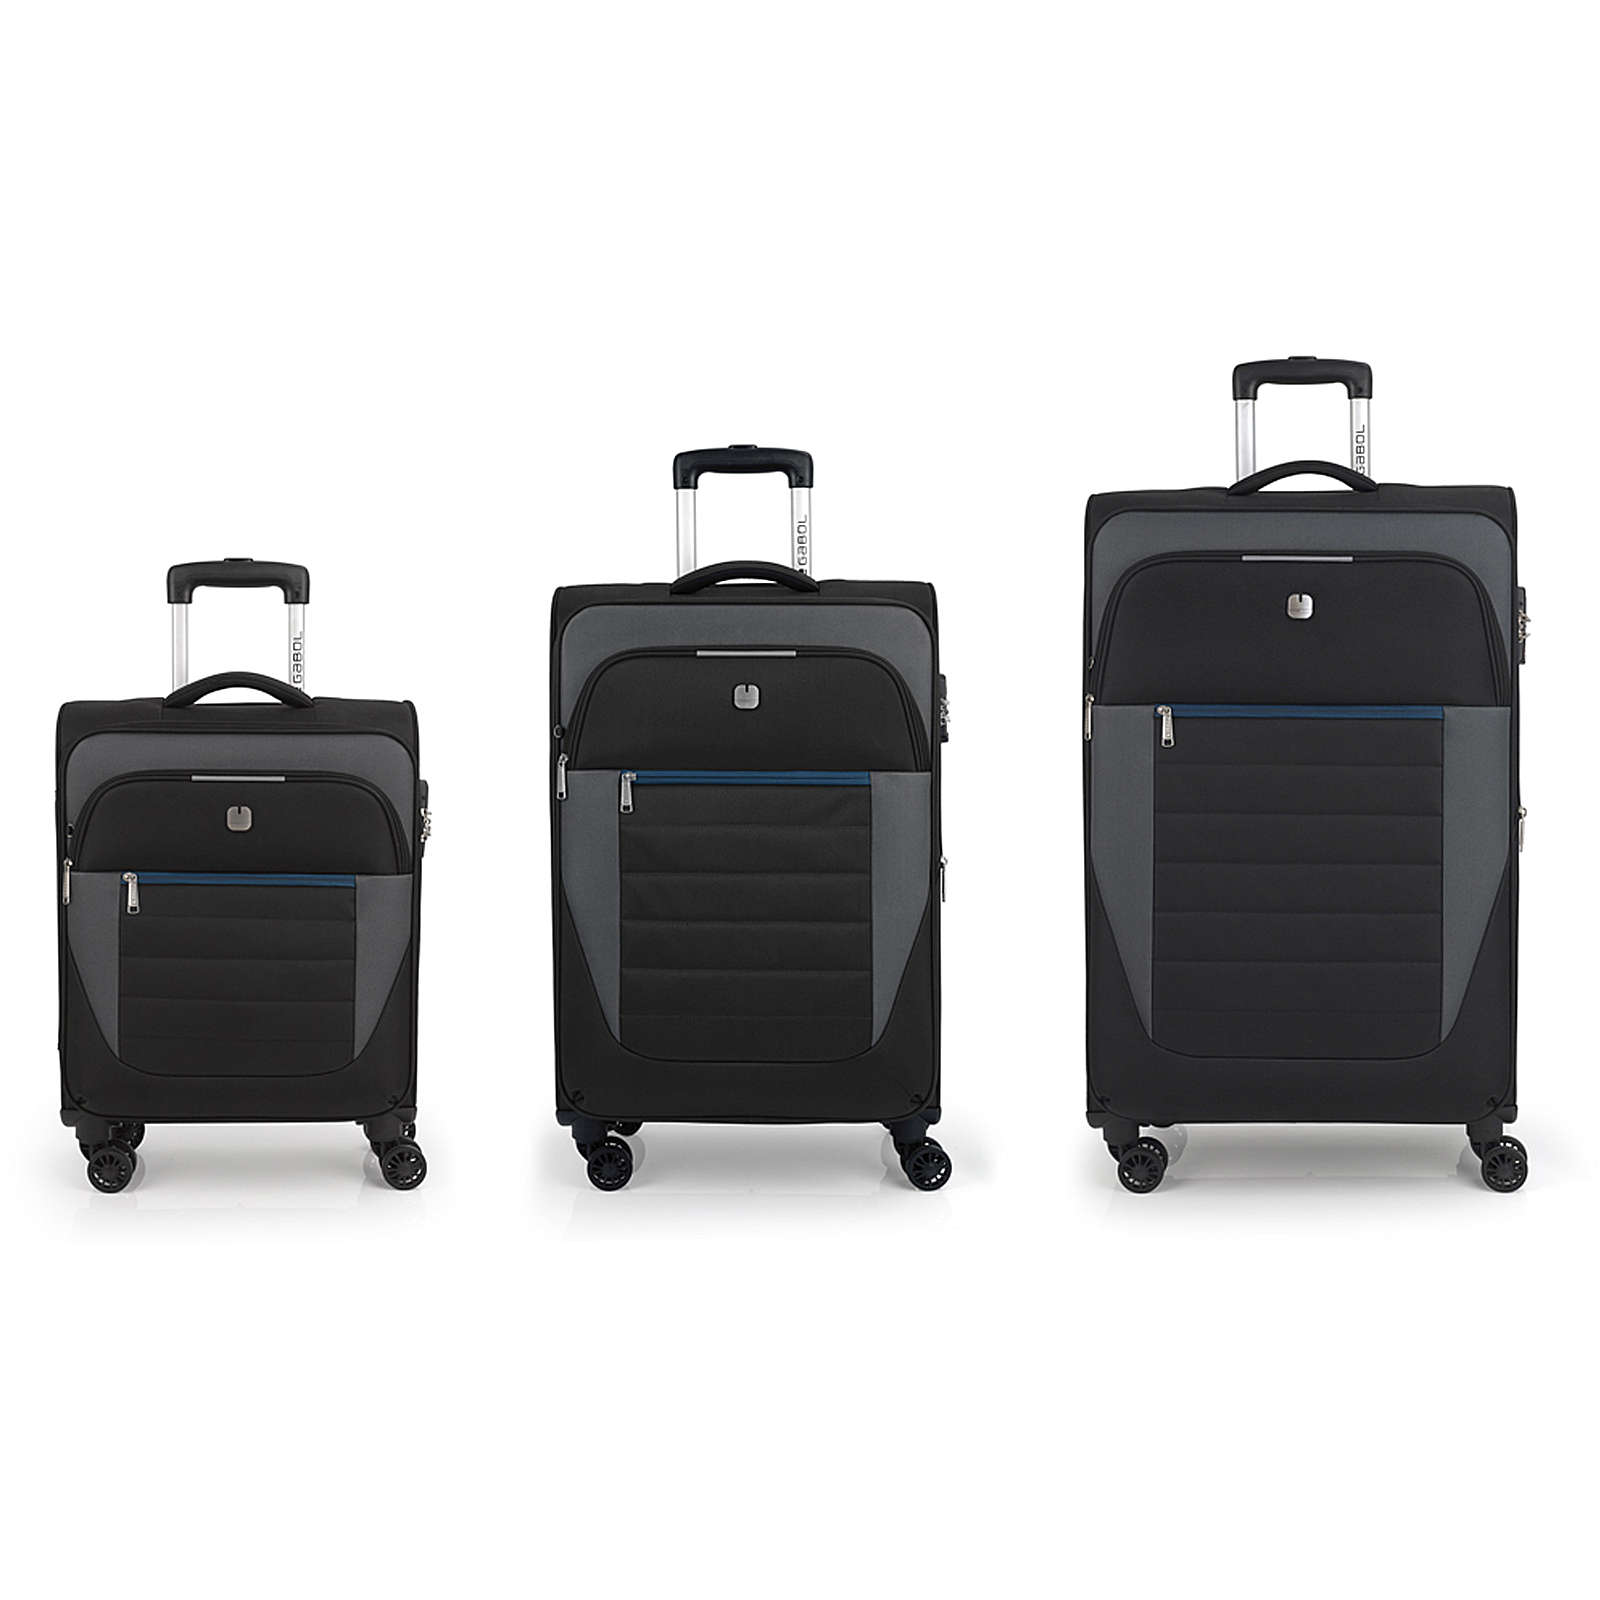 Gabol Sky 4-Rollen Kofferset 3tlg. Trolleys schwarz